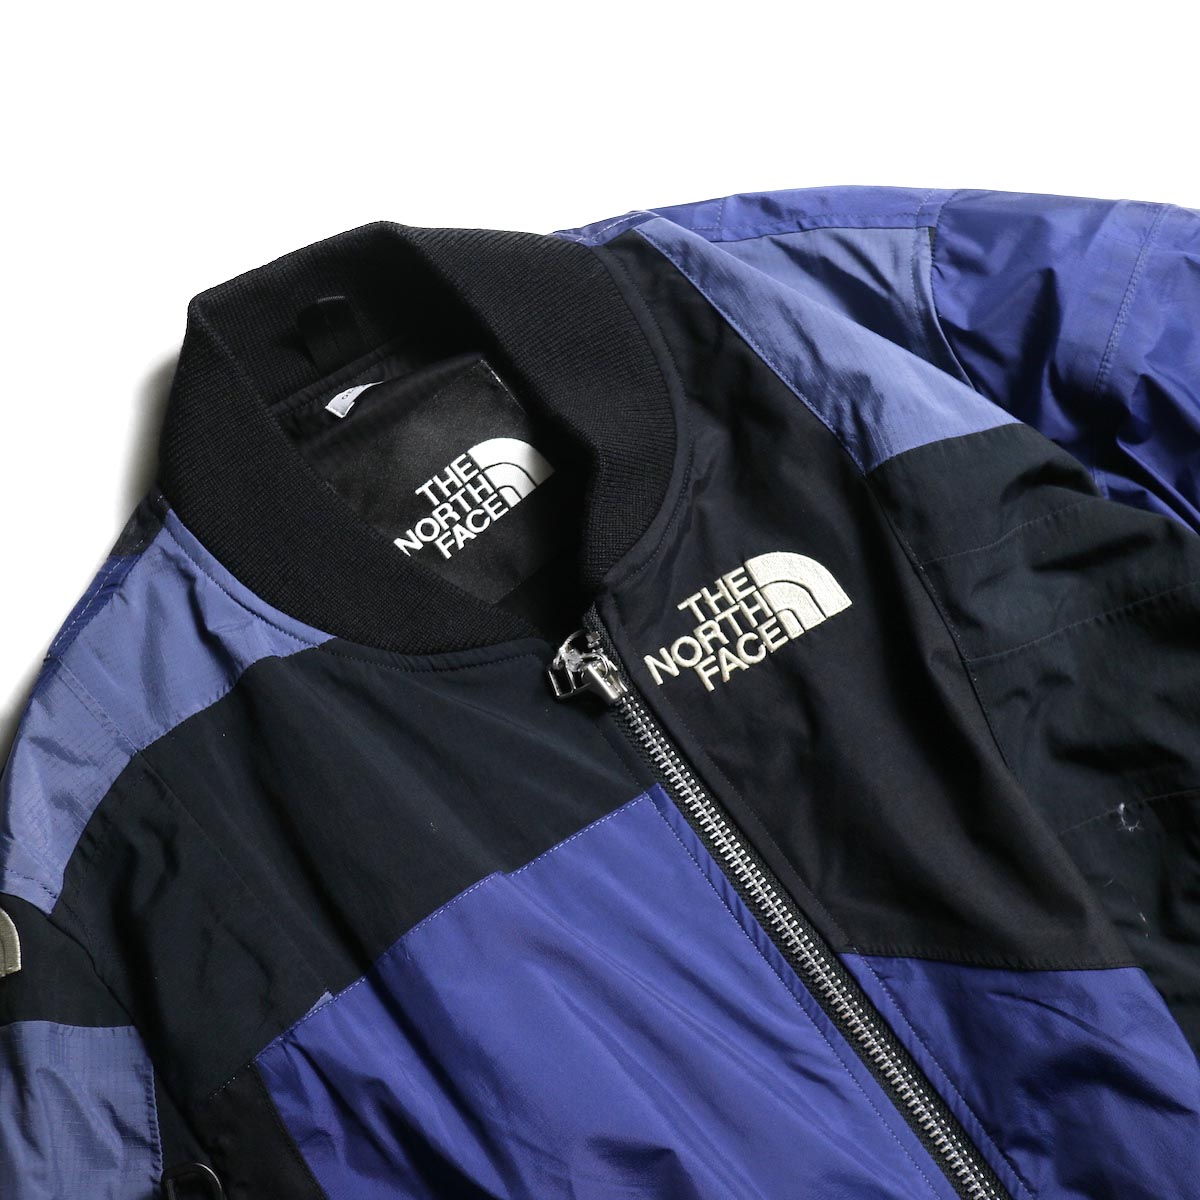 OLD PARK / Flight Jacket (OUTDOOR)(XLsize) 襟